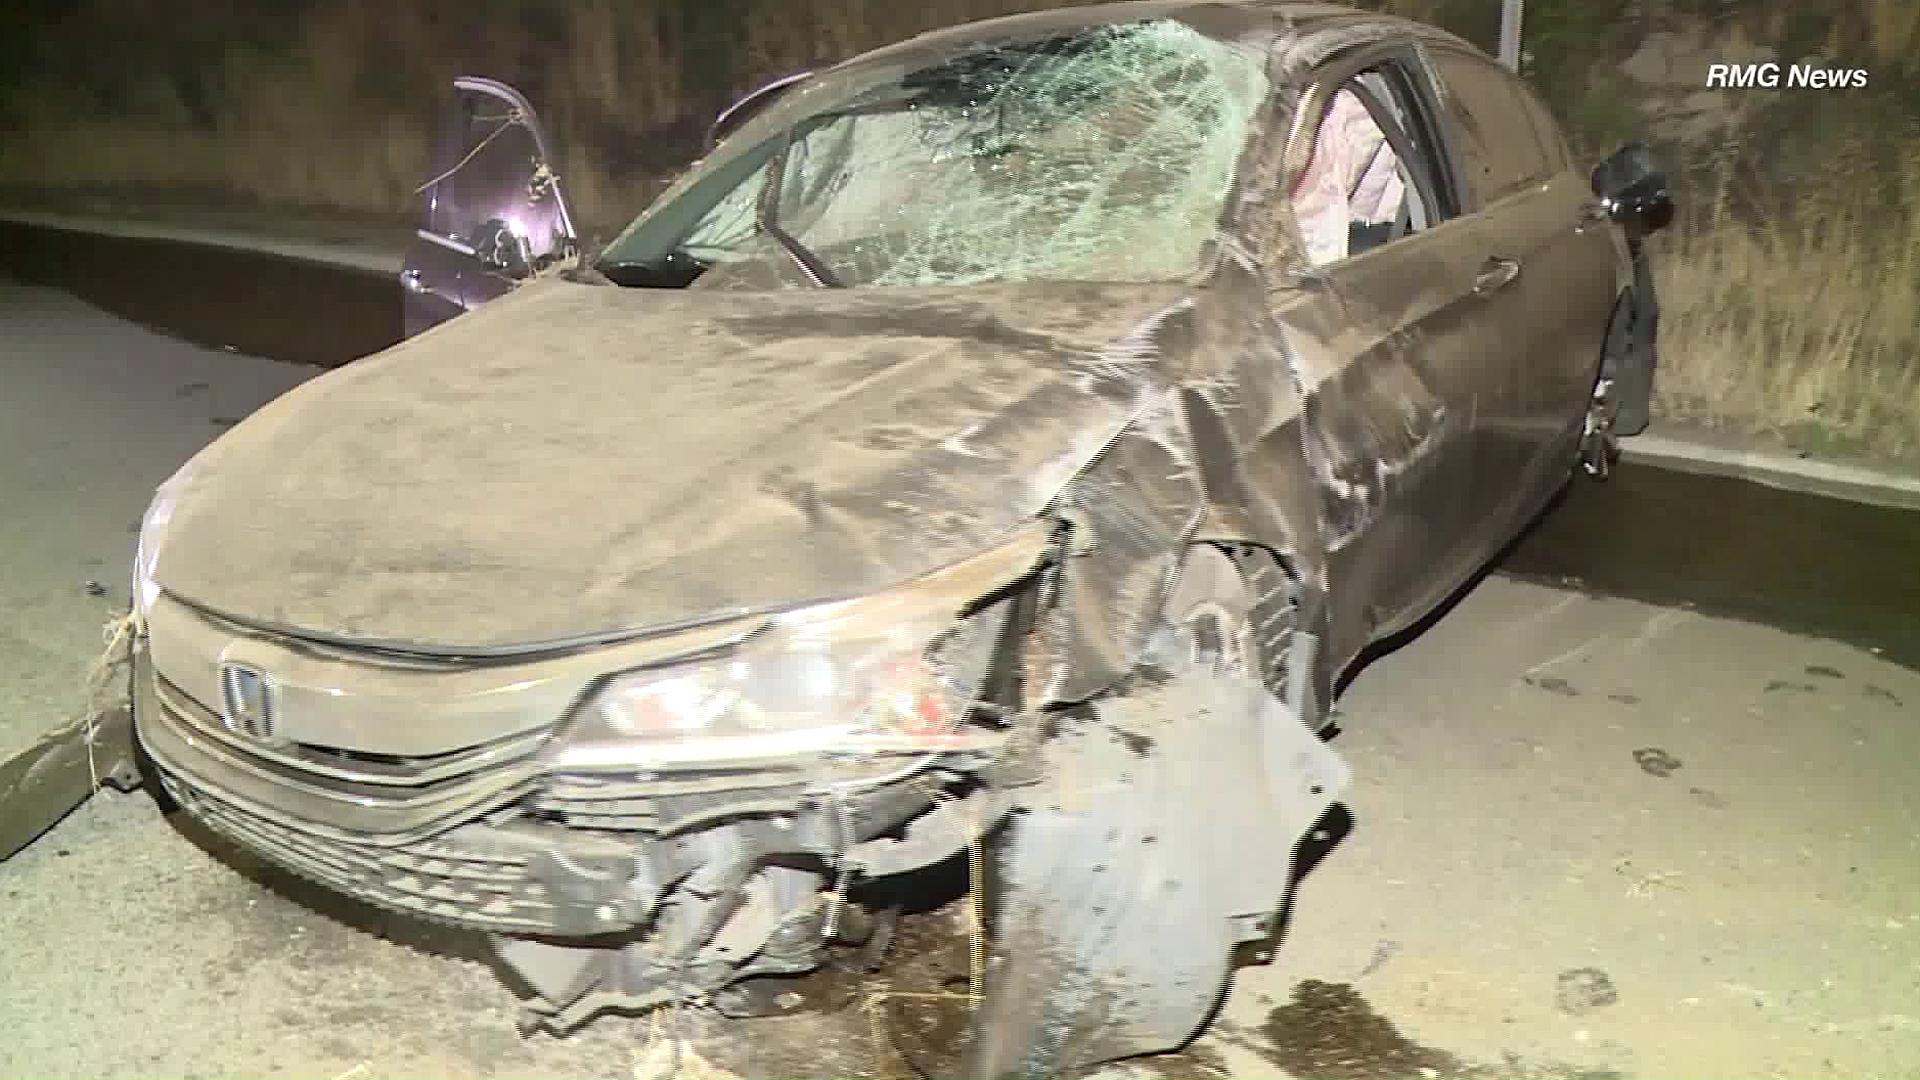 A Honda Accord is seen following a hit-and-run crash in Shadow Hills on May 8, 2019. (Credit: RMG News)